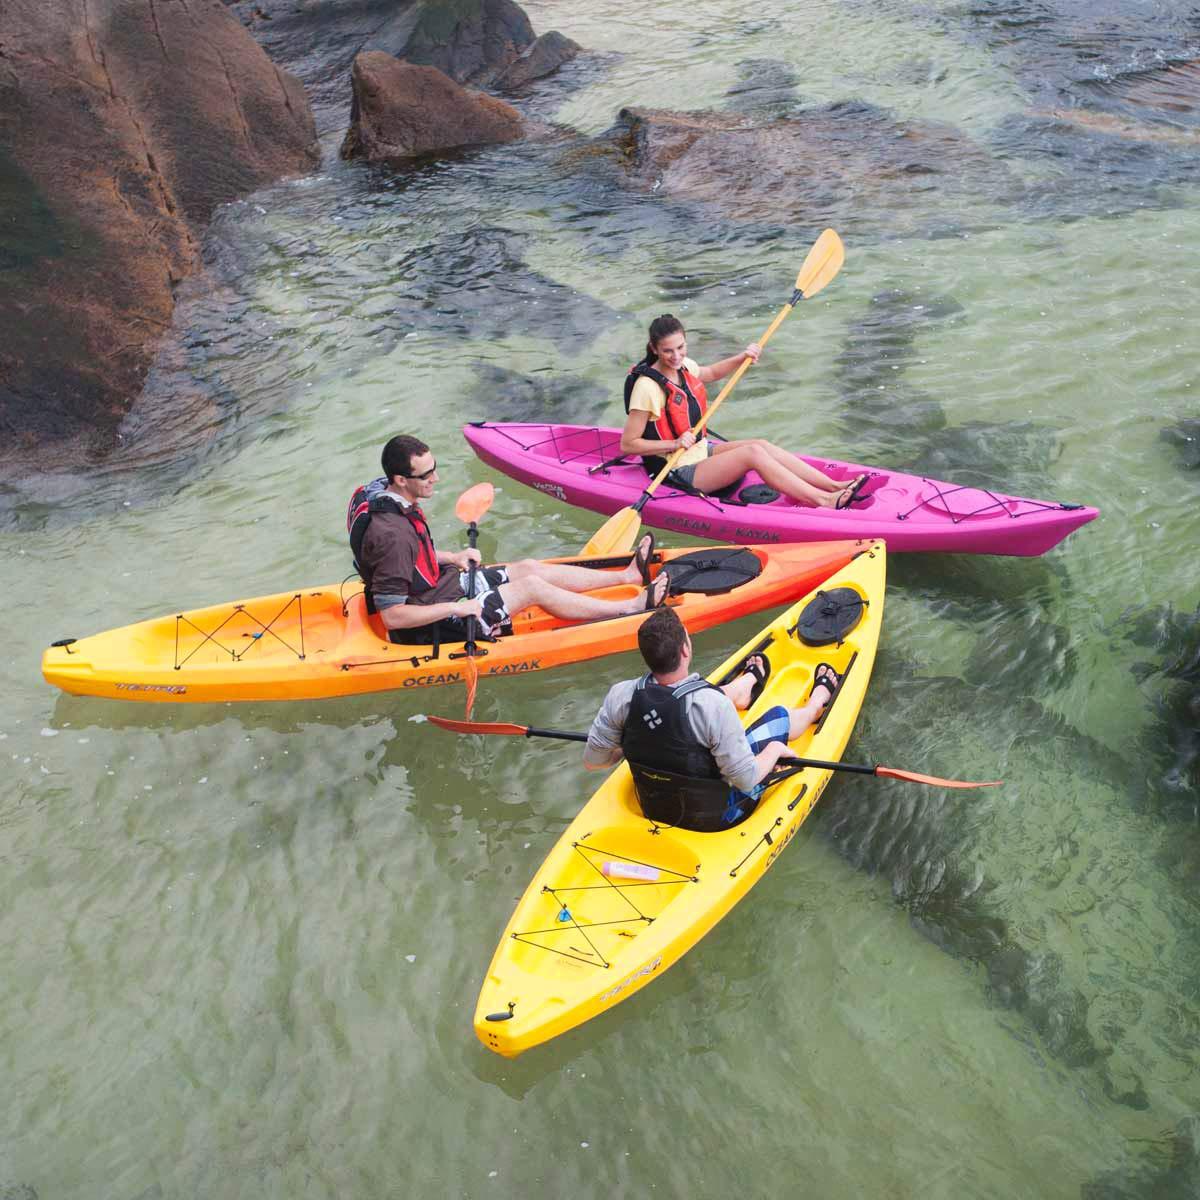 Ocean Kayak Tetra 10 Kayak - Sit-On-Top